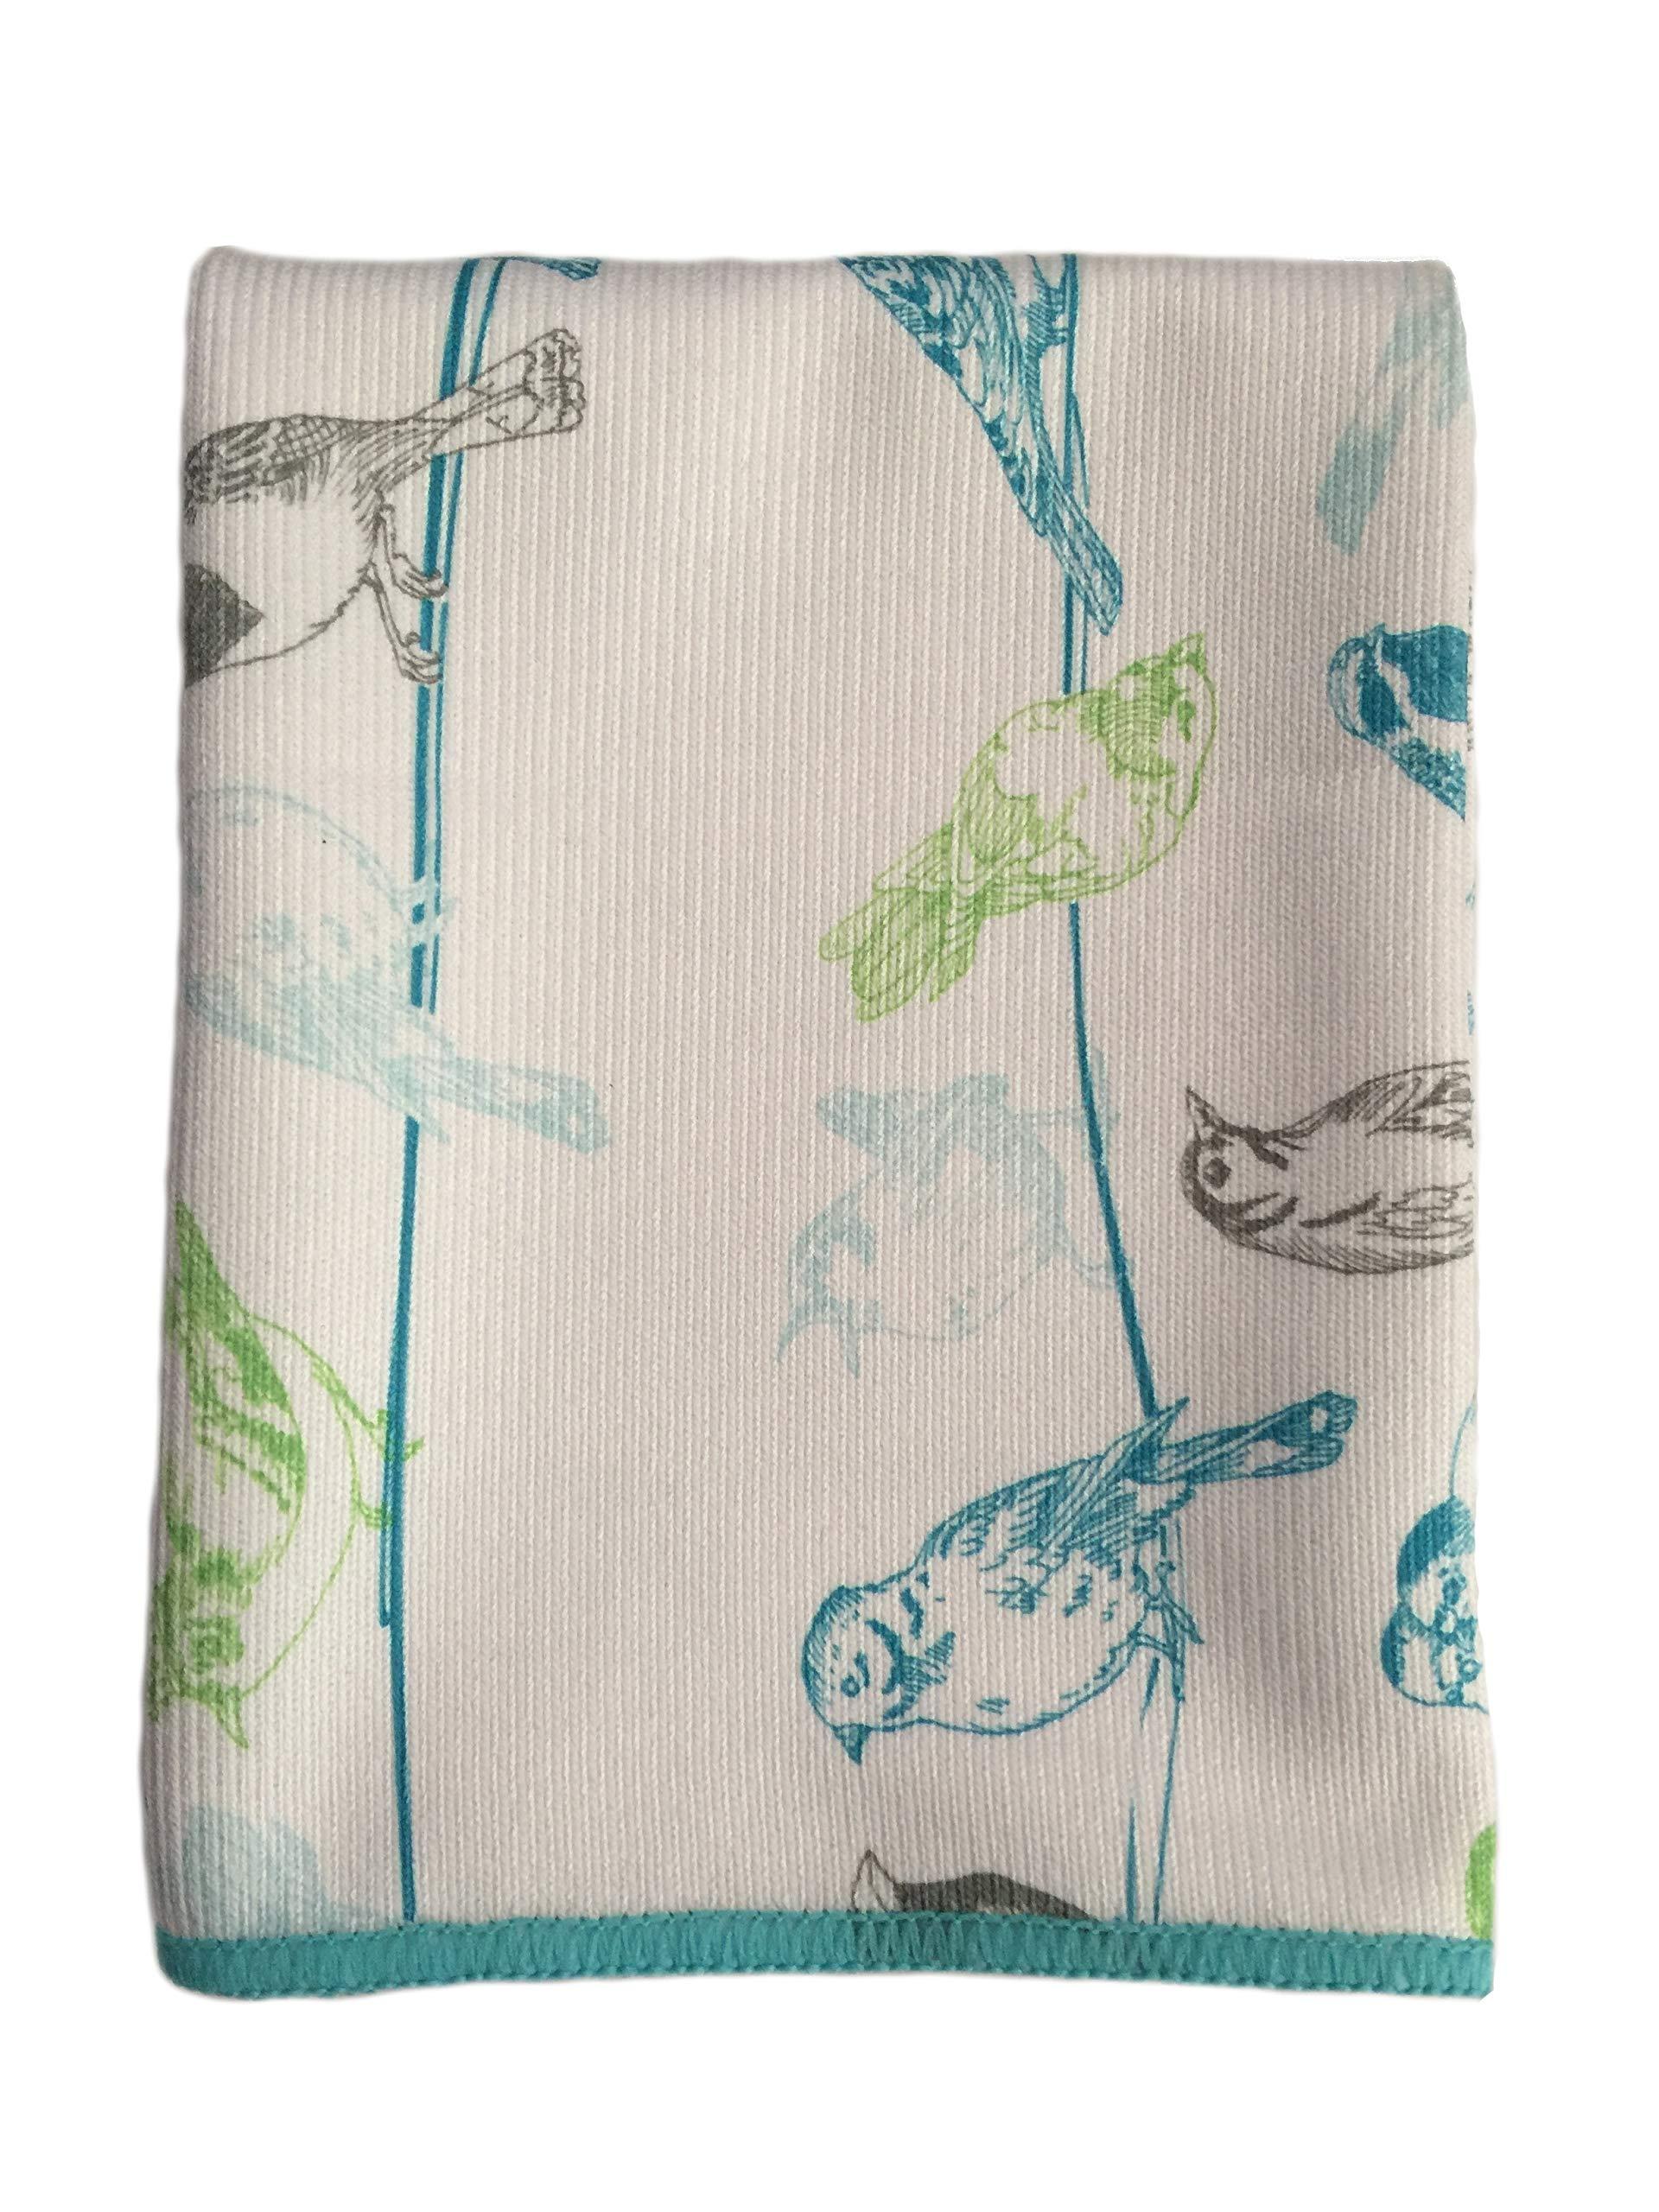 Norwex Limited Edition Window Cloth - Birds